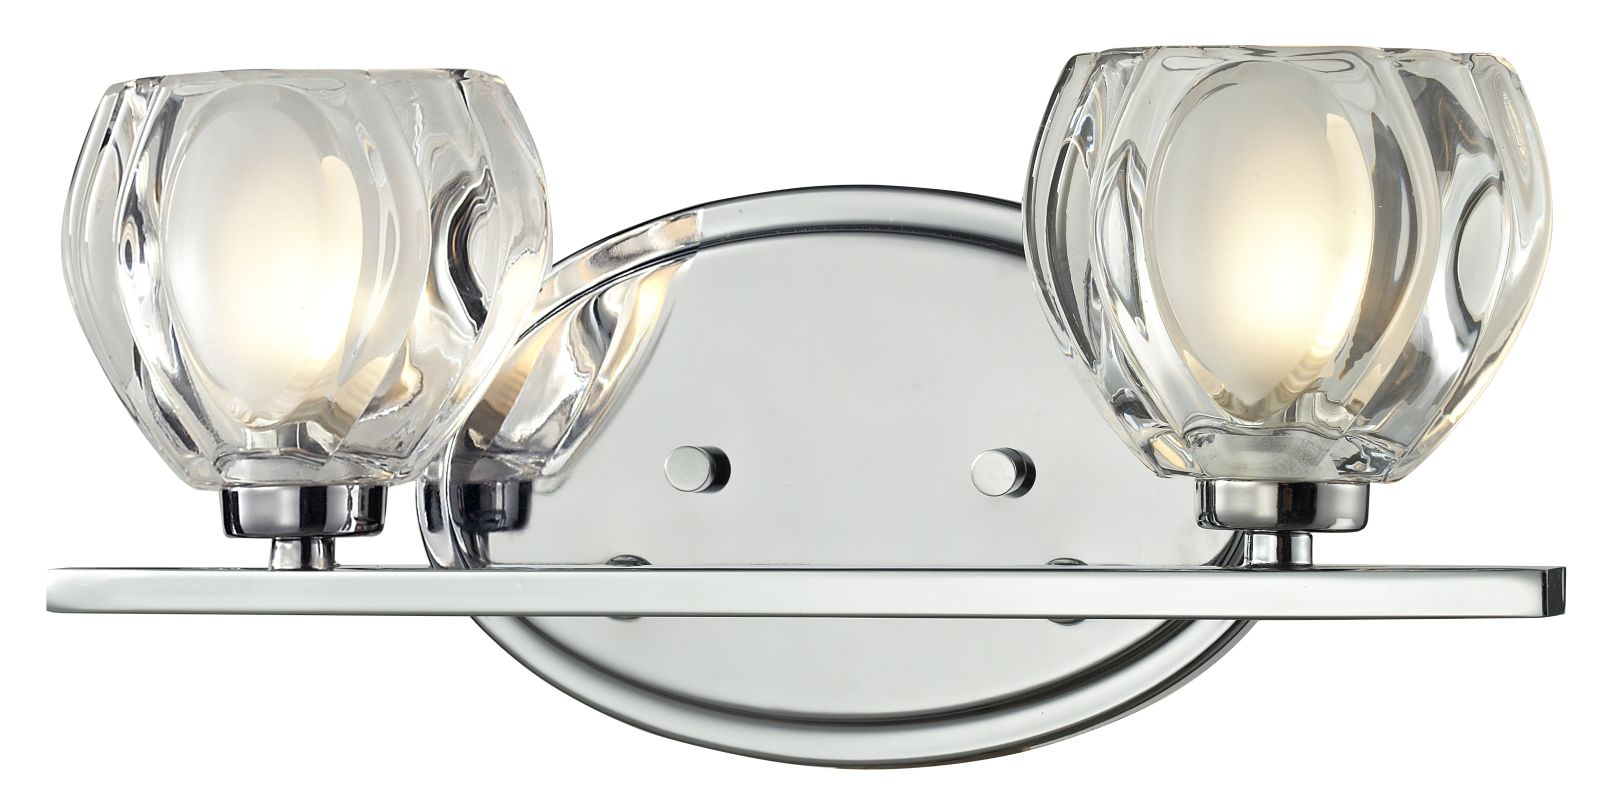 Z-Lite 3023-2V Hale 2 Light ADA Compliant Bathroom Vanity Light with